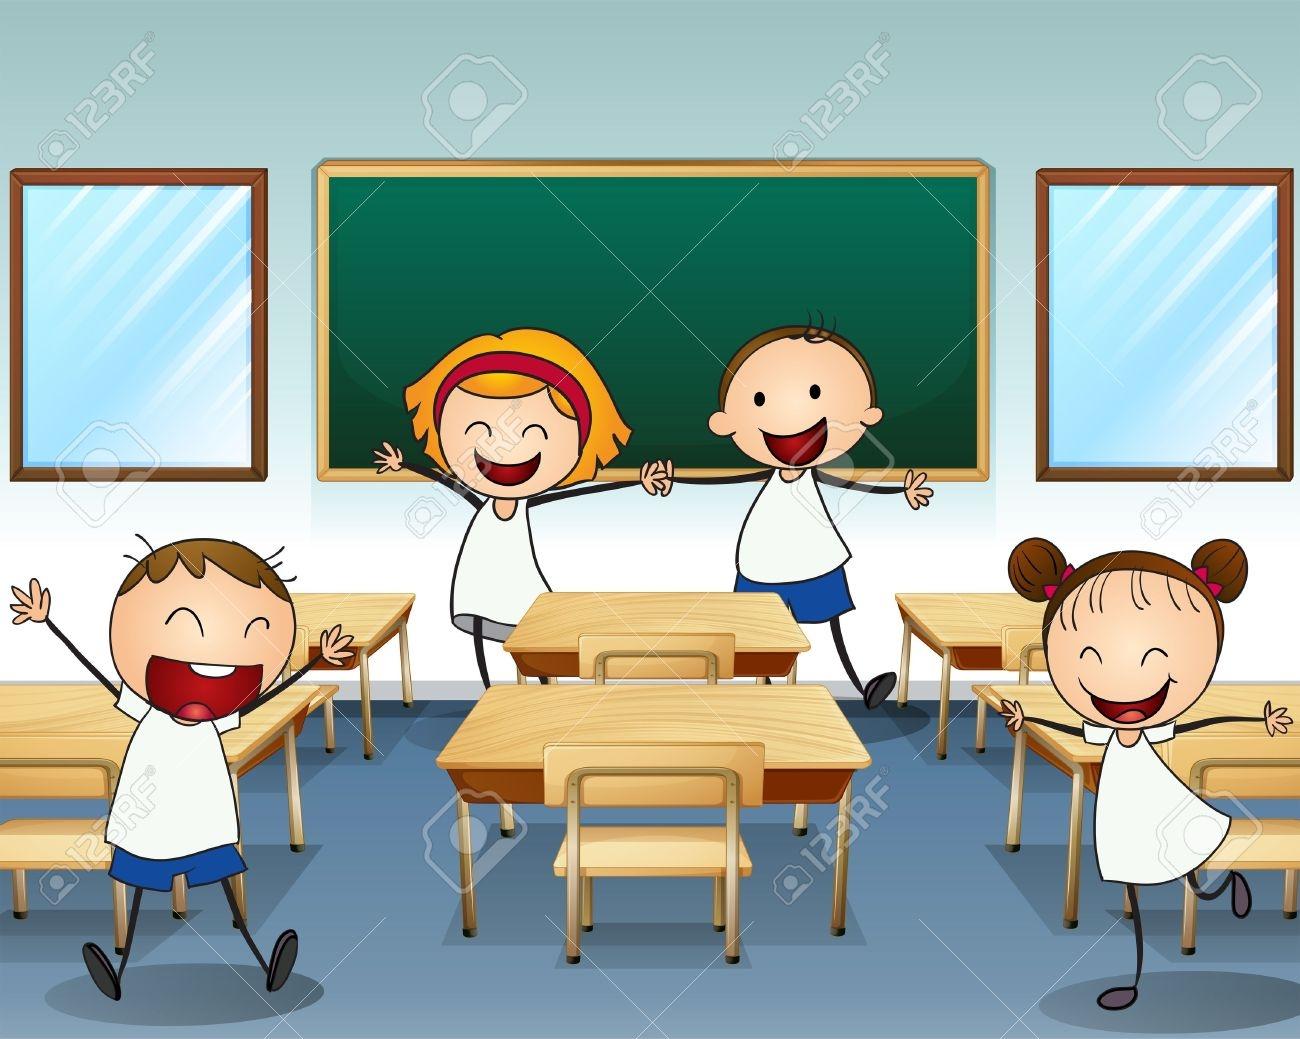 Phone clipart classroom #5